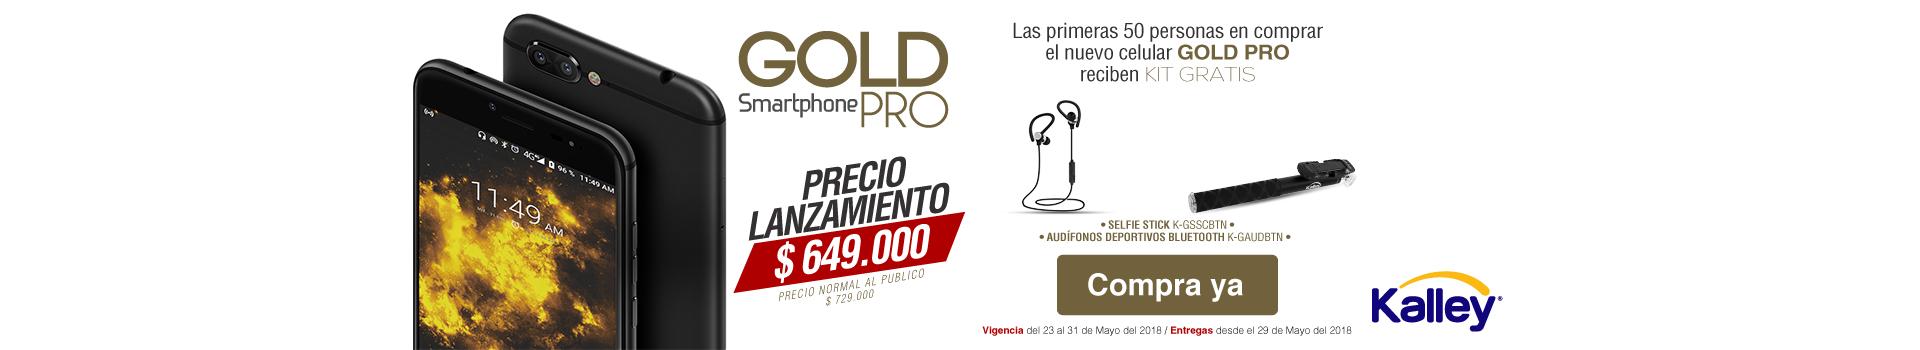 PPAL ALKP-6-celulares-Celular Libre KALLEY Gold Pro Negro DS 4G-prod-Mayo24-31